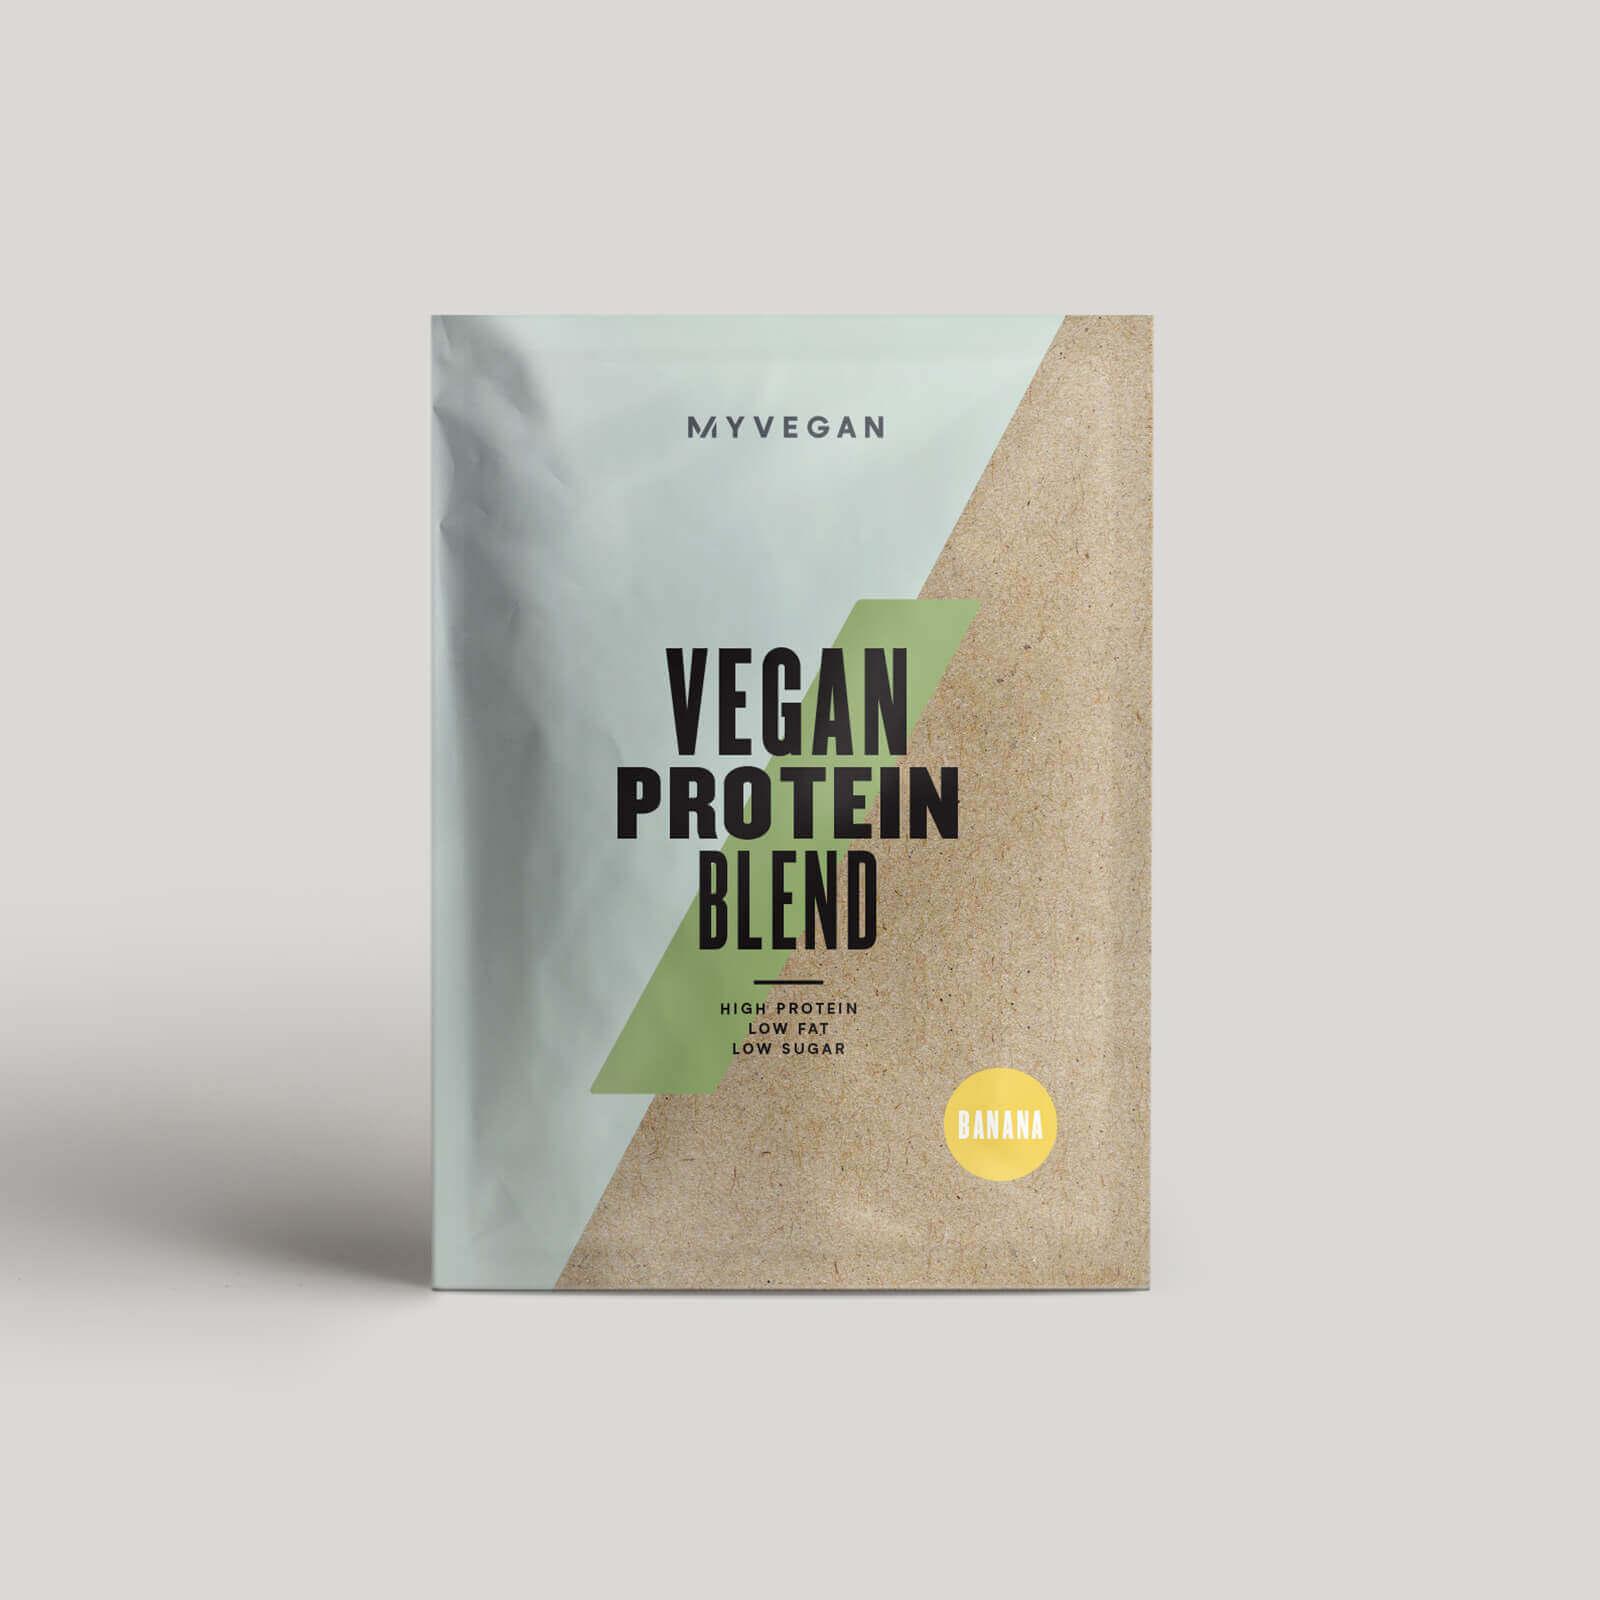 Myvegan Vegan Protein Blend (Sample) - Banane